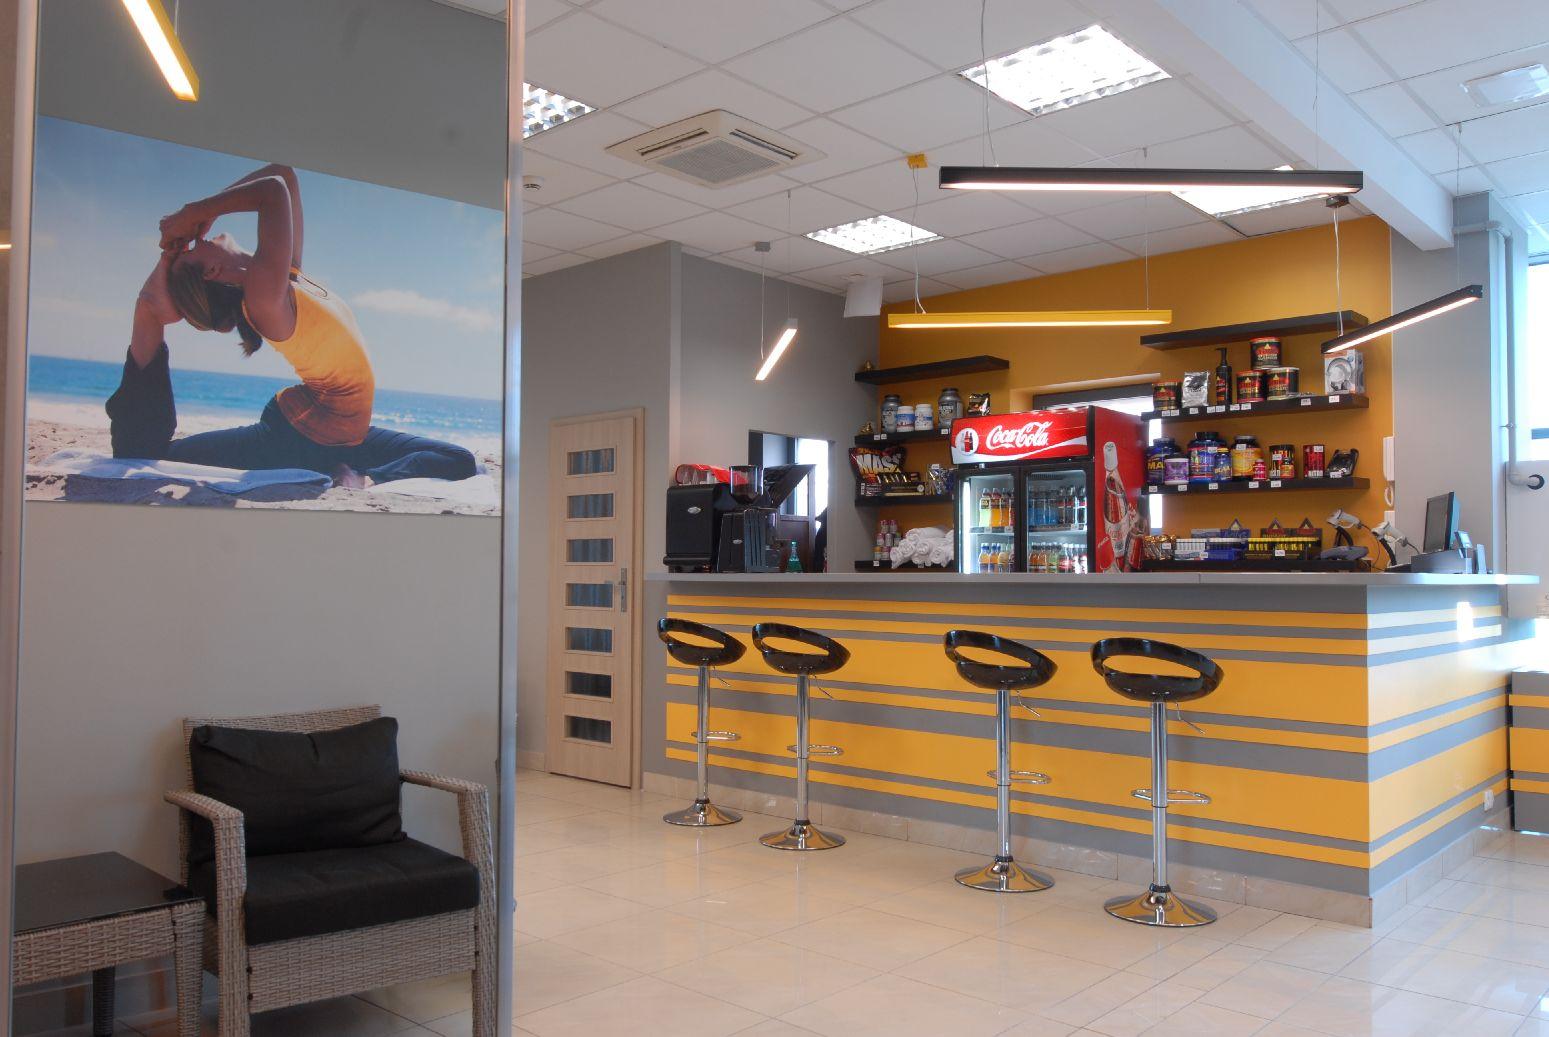 drink_bar_w_fitness_studio.JPG